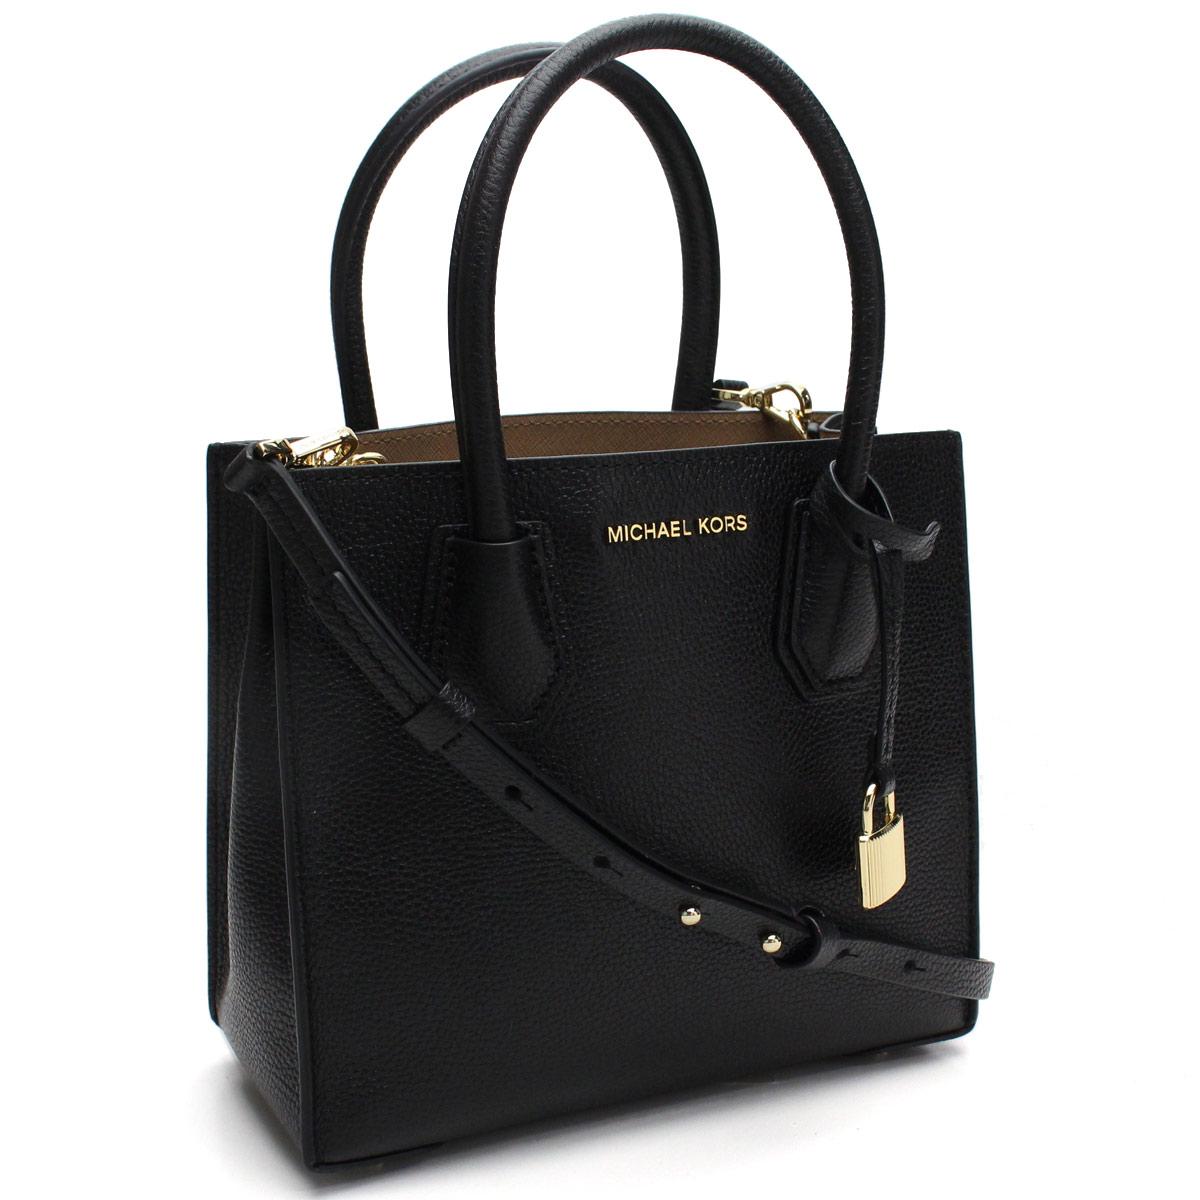 94619492044a Bighit The total brand wholesale: Michael Kors (MICHAEL KORS) MERCER ...